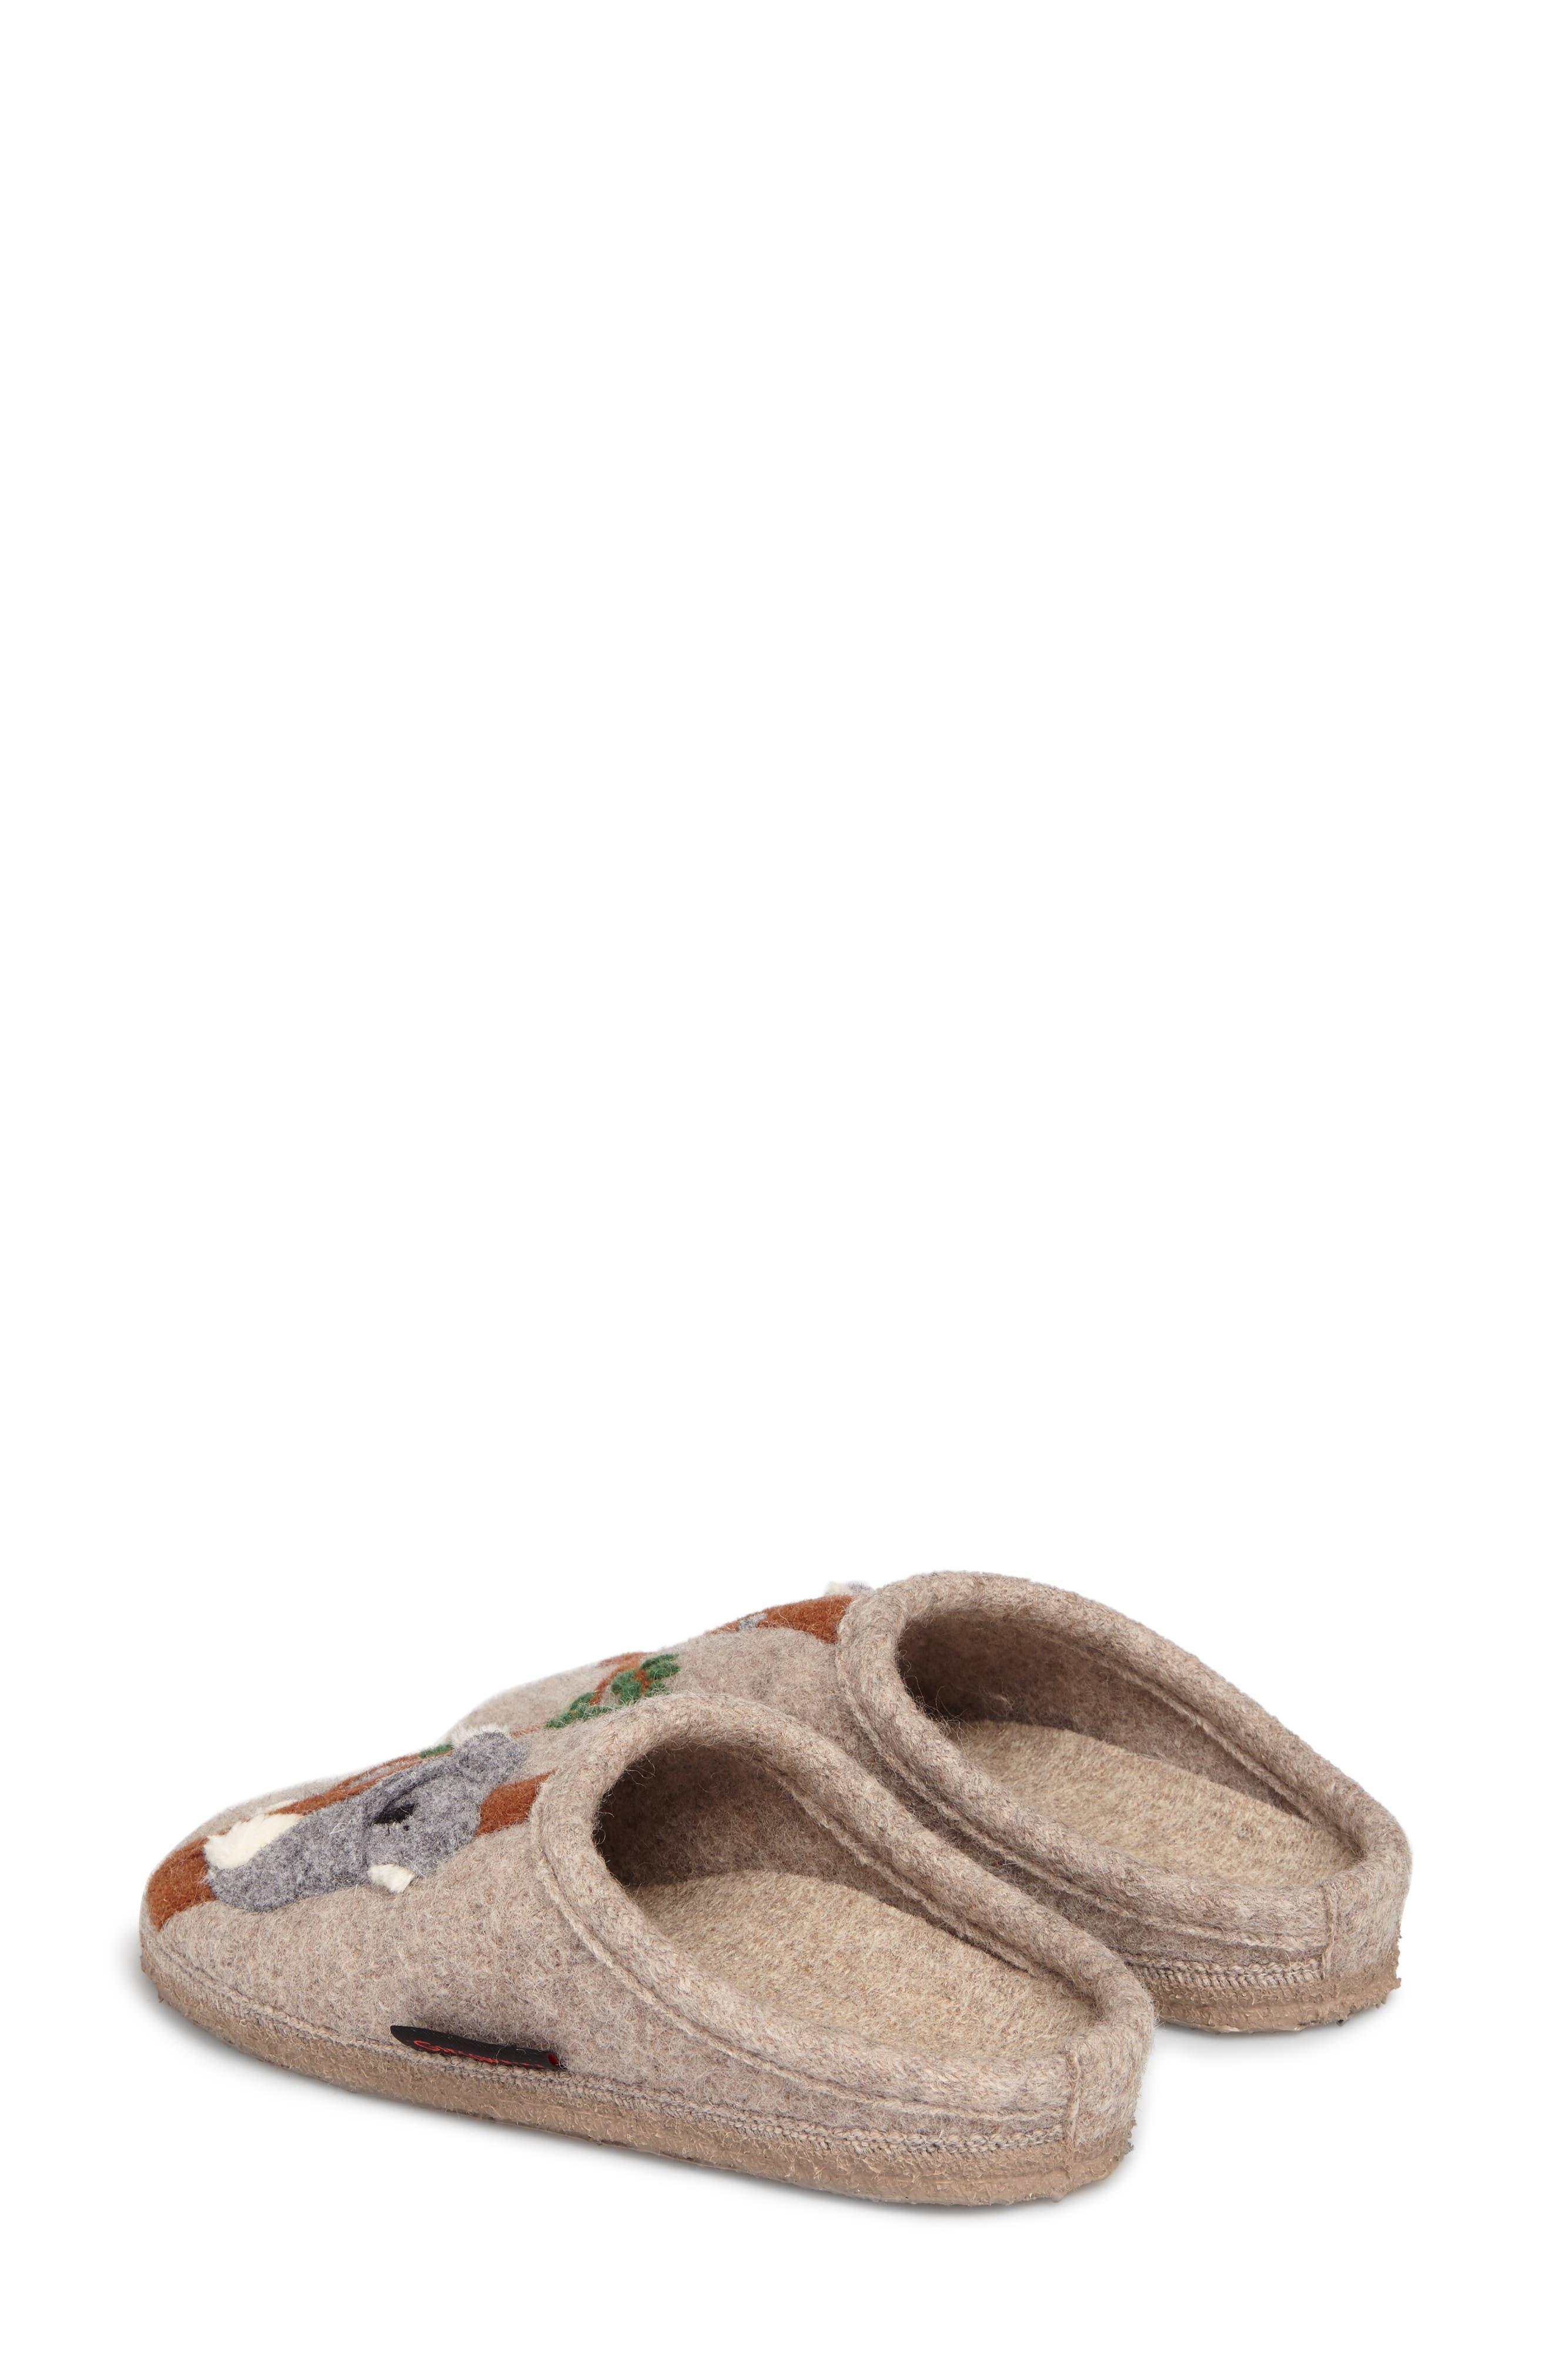 Koala Indoor Boiled Wool Slipper,                             Alternate thumbnail 2, color,                             NATURAL WOOL